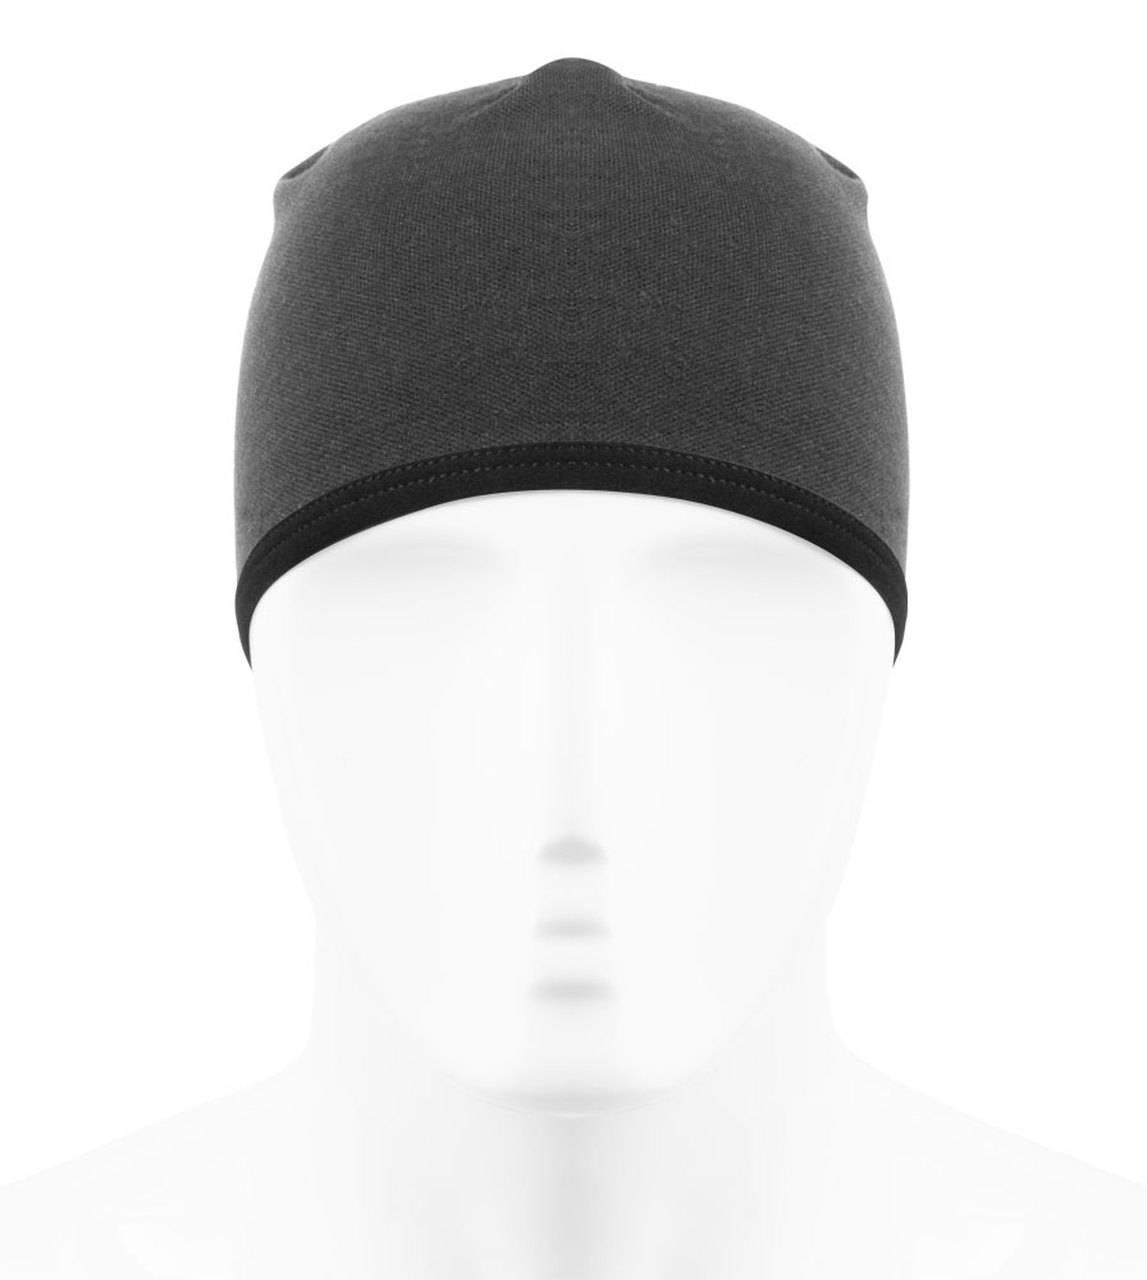 merino wool skull cap front view